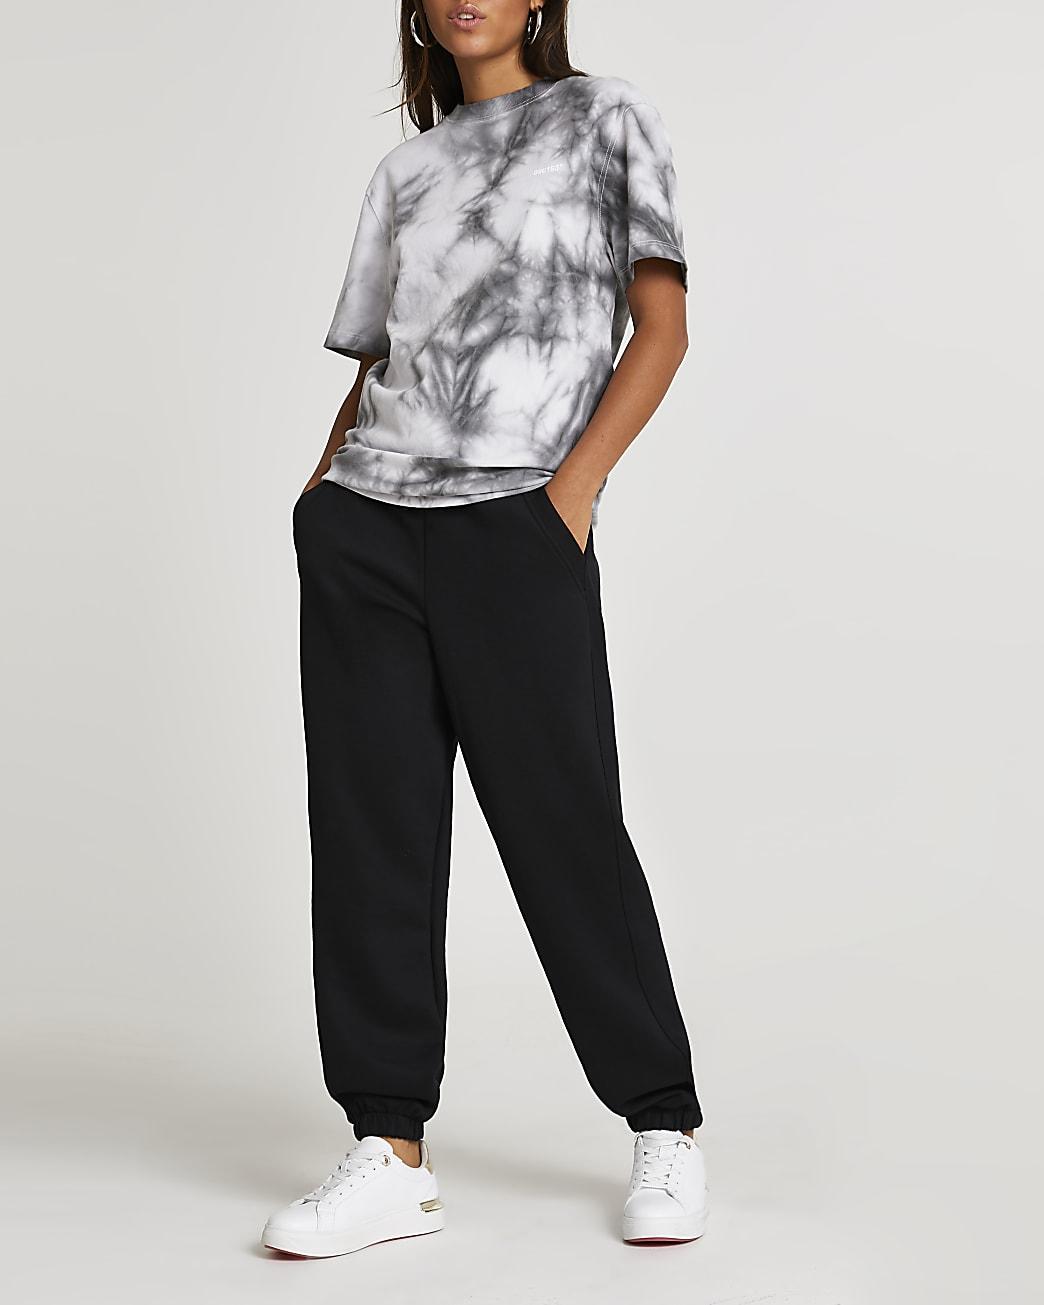 Grey tie dye oversized t-shirt